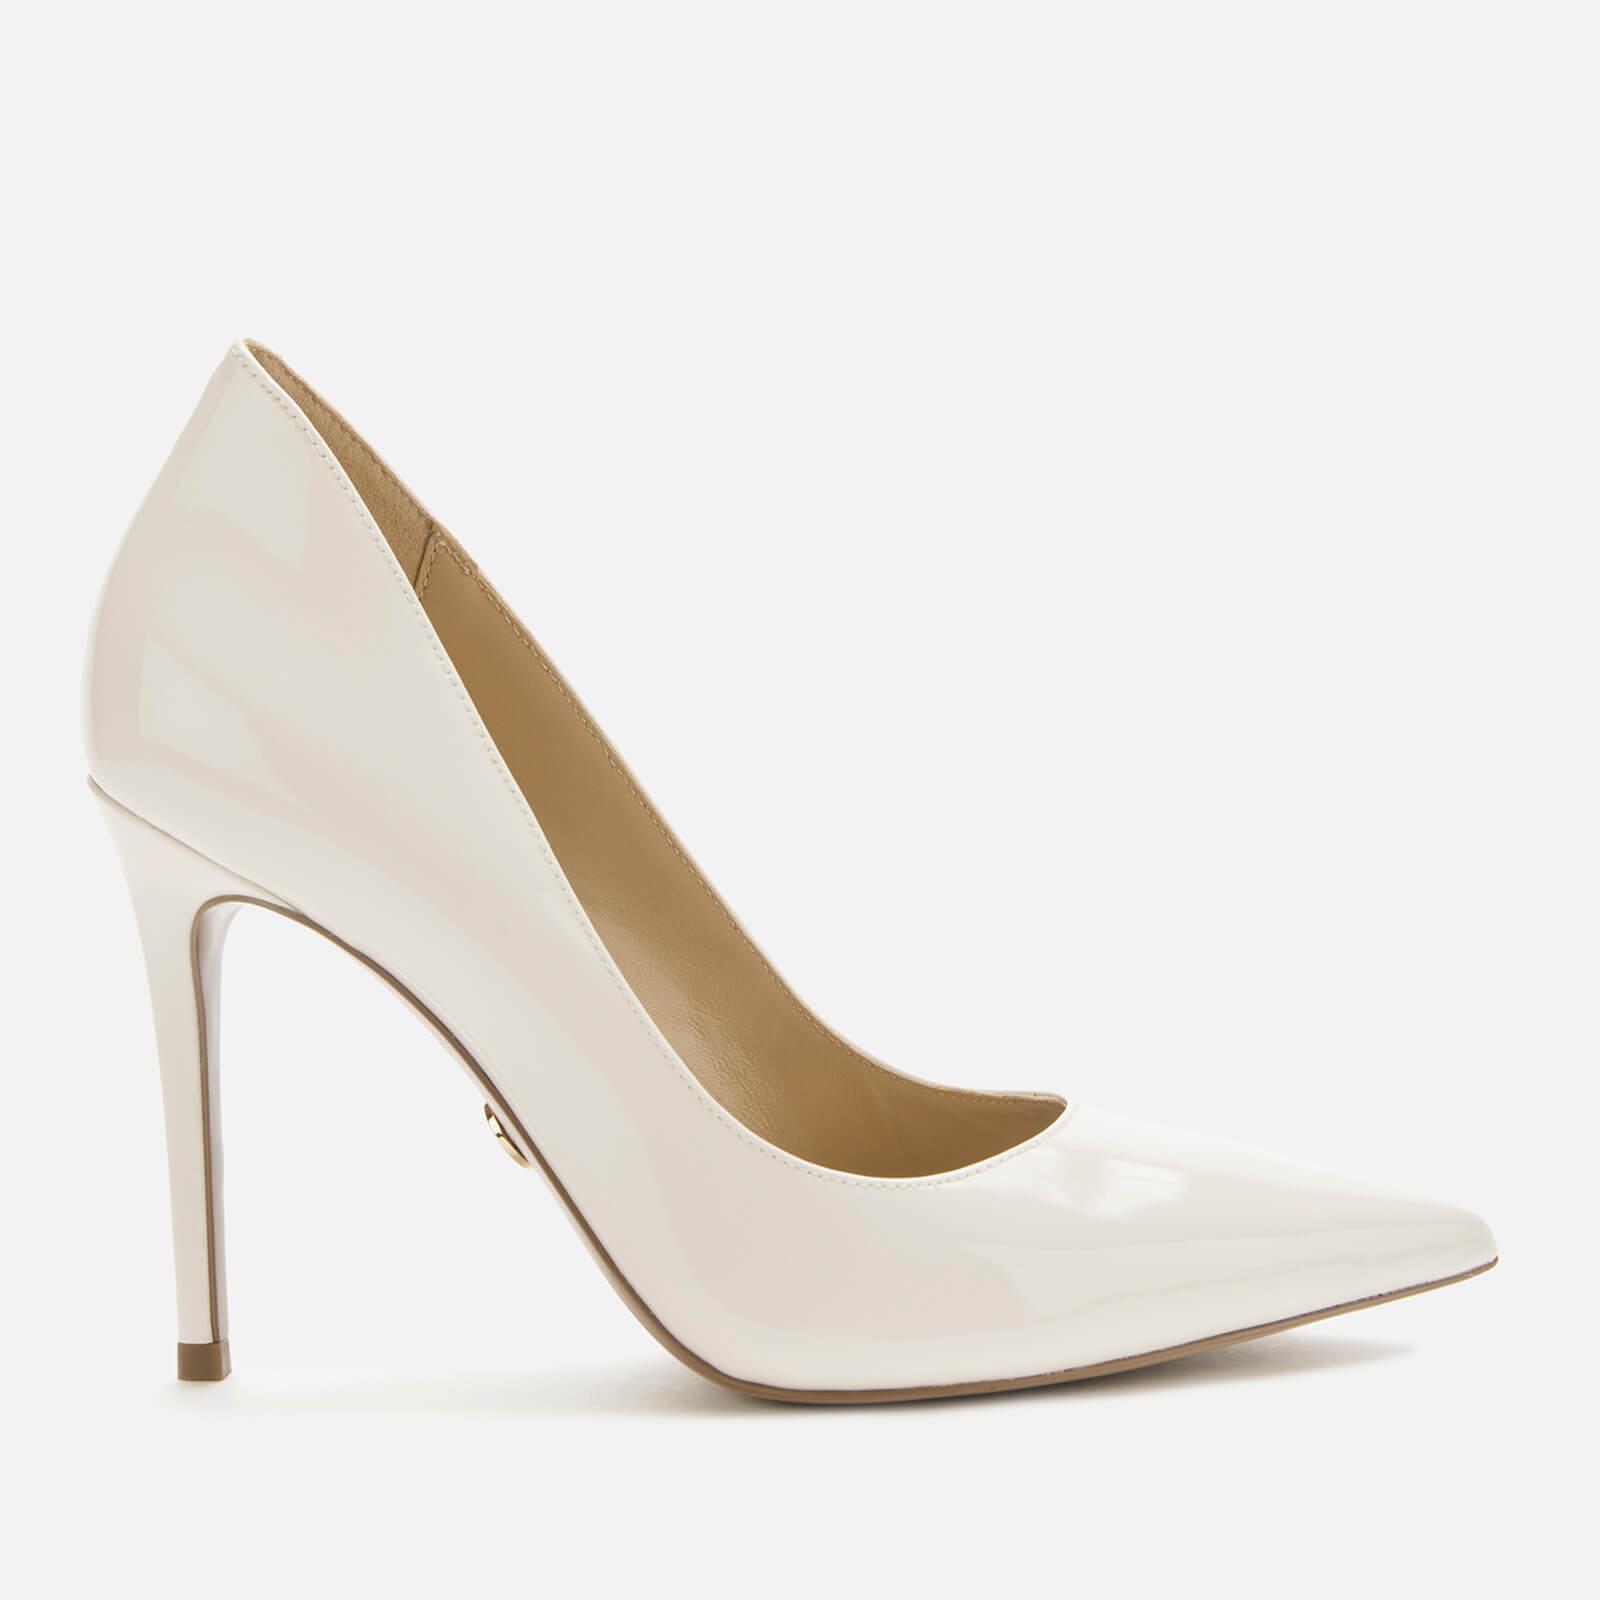 MICHAEL MICHAEL KORS Women's Keke Patent Leather Court Shoes - Light Cream - UK 5/US 8